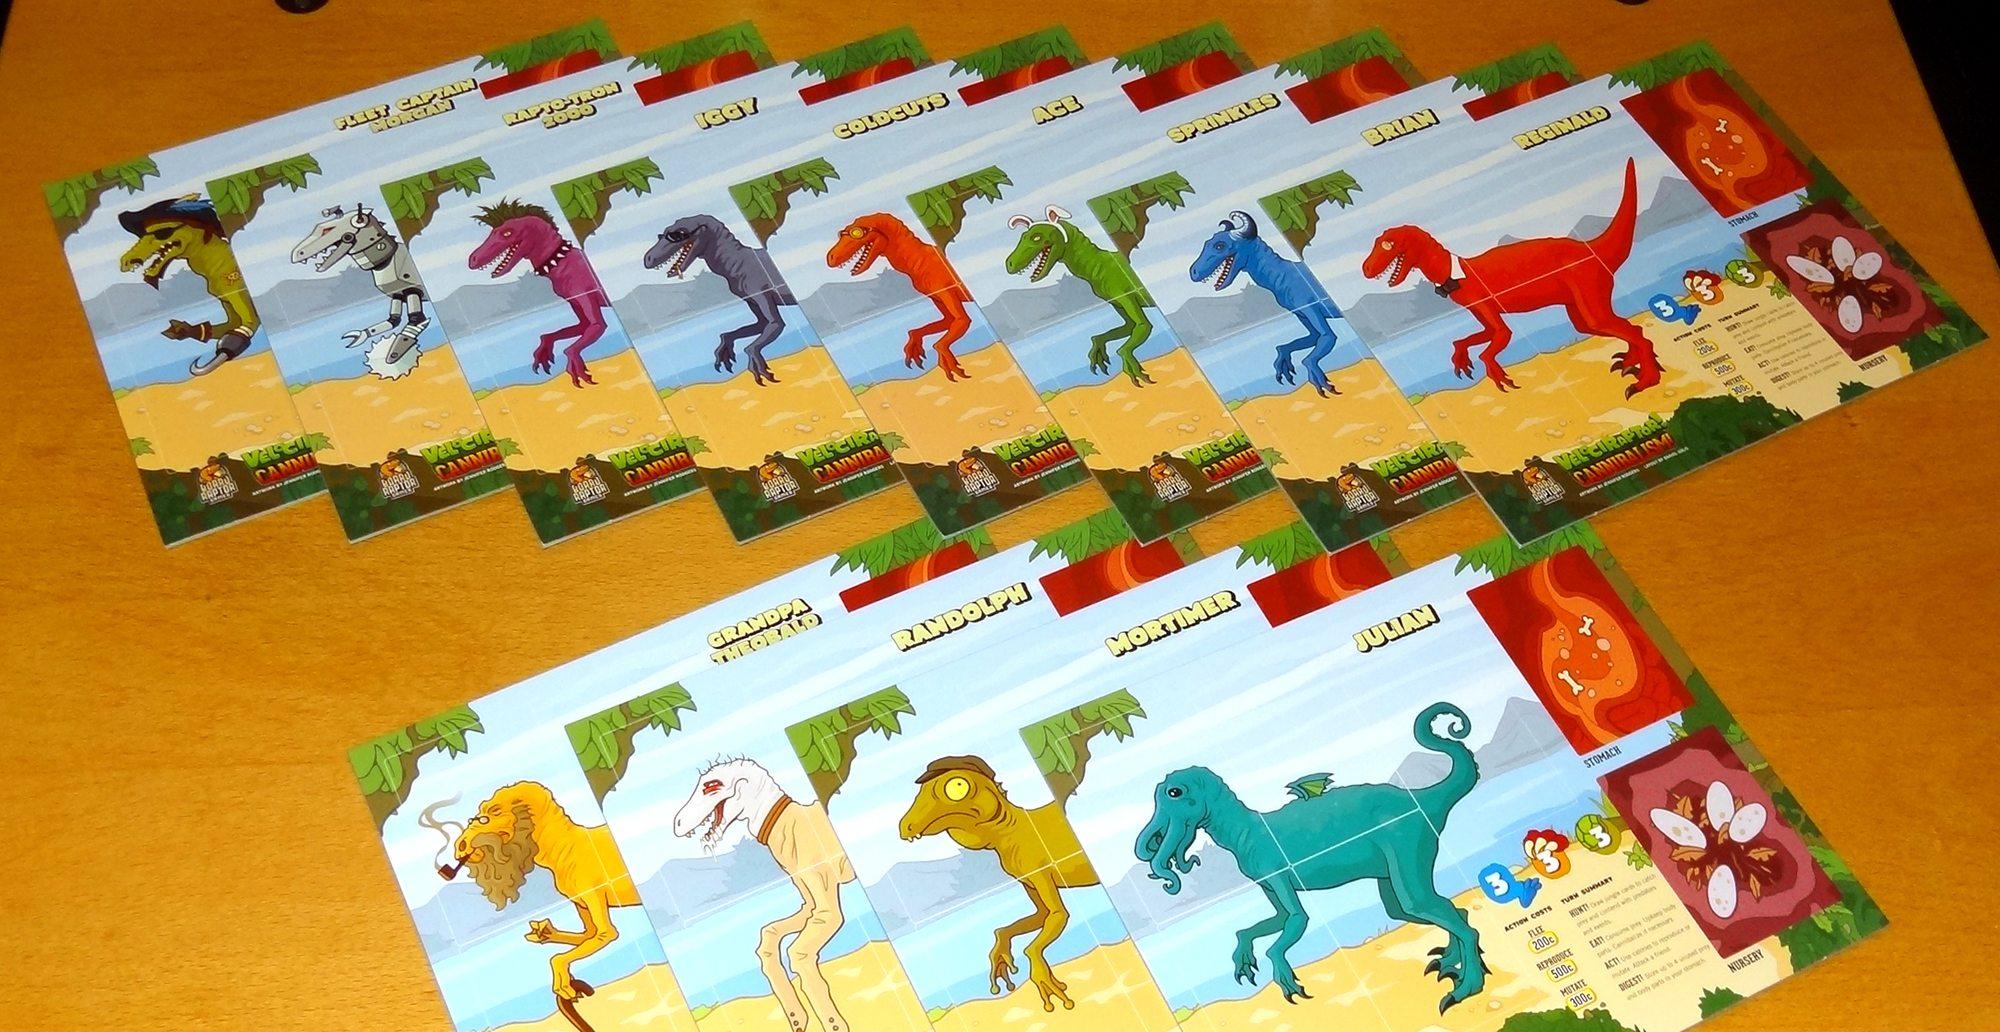 Velociraptor! Cannibalism! player mats